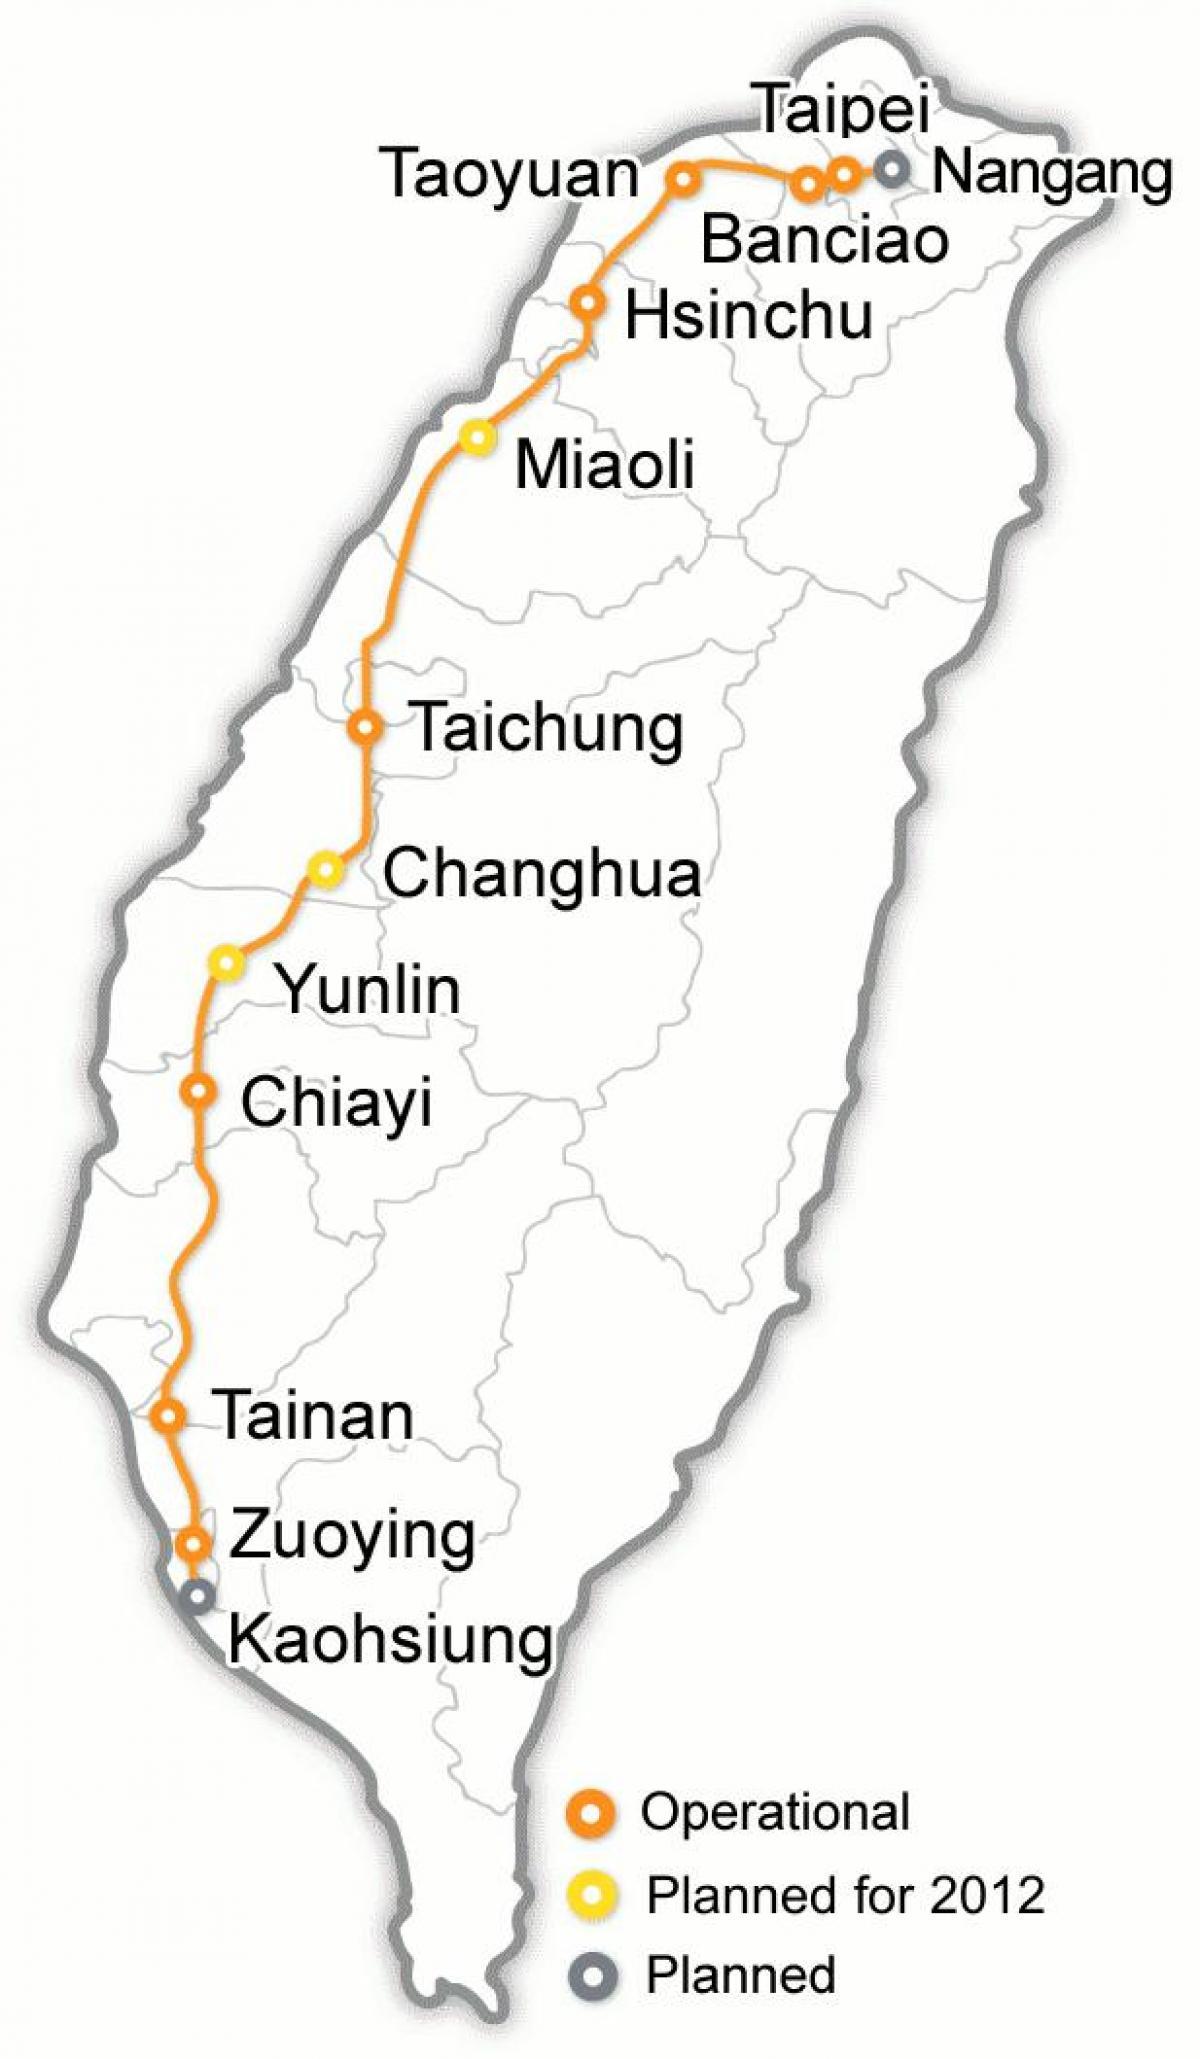 Taiwan high speed rail station map - Taiwan bullet train map